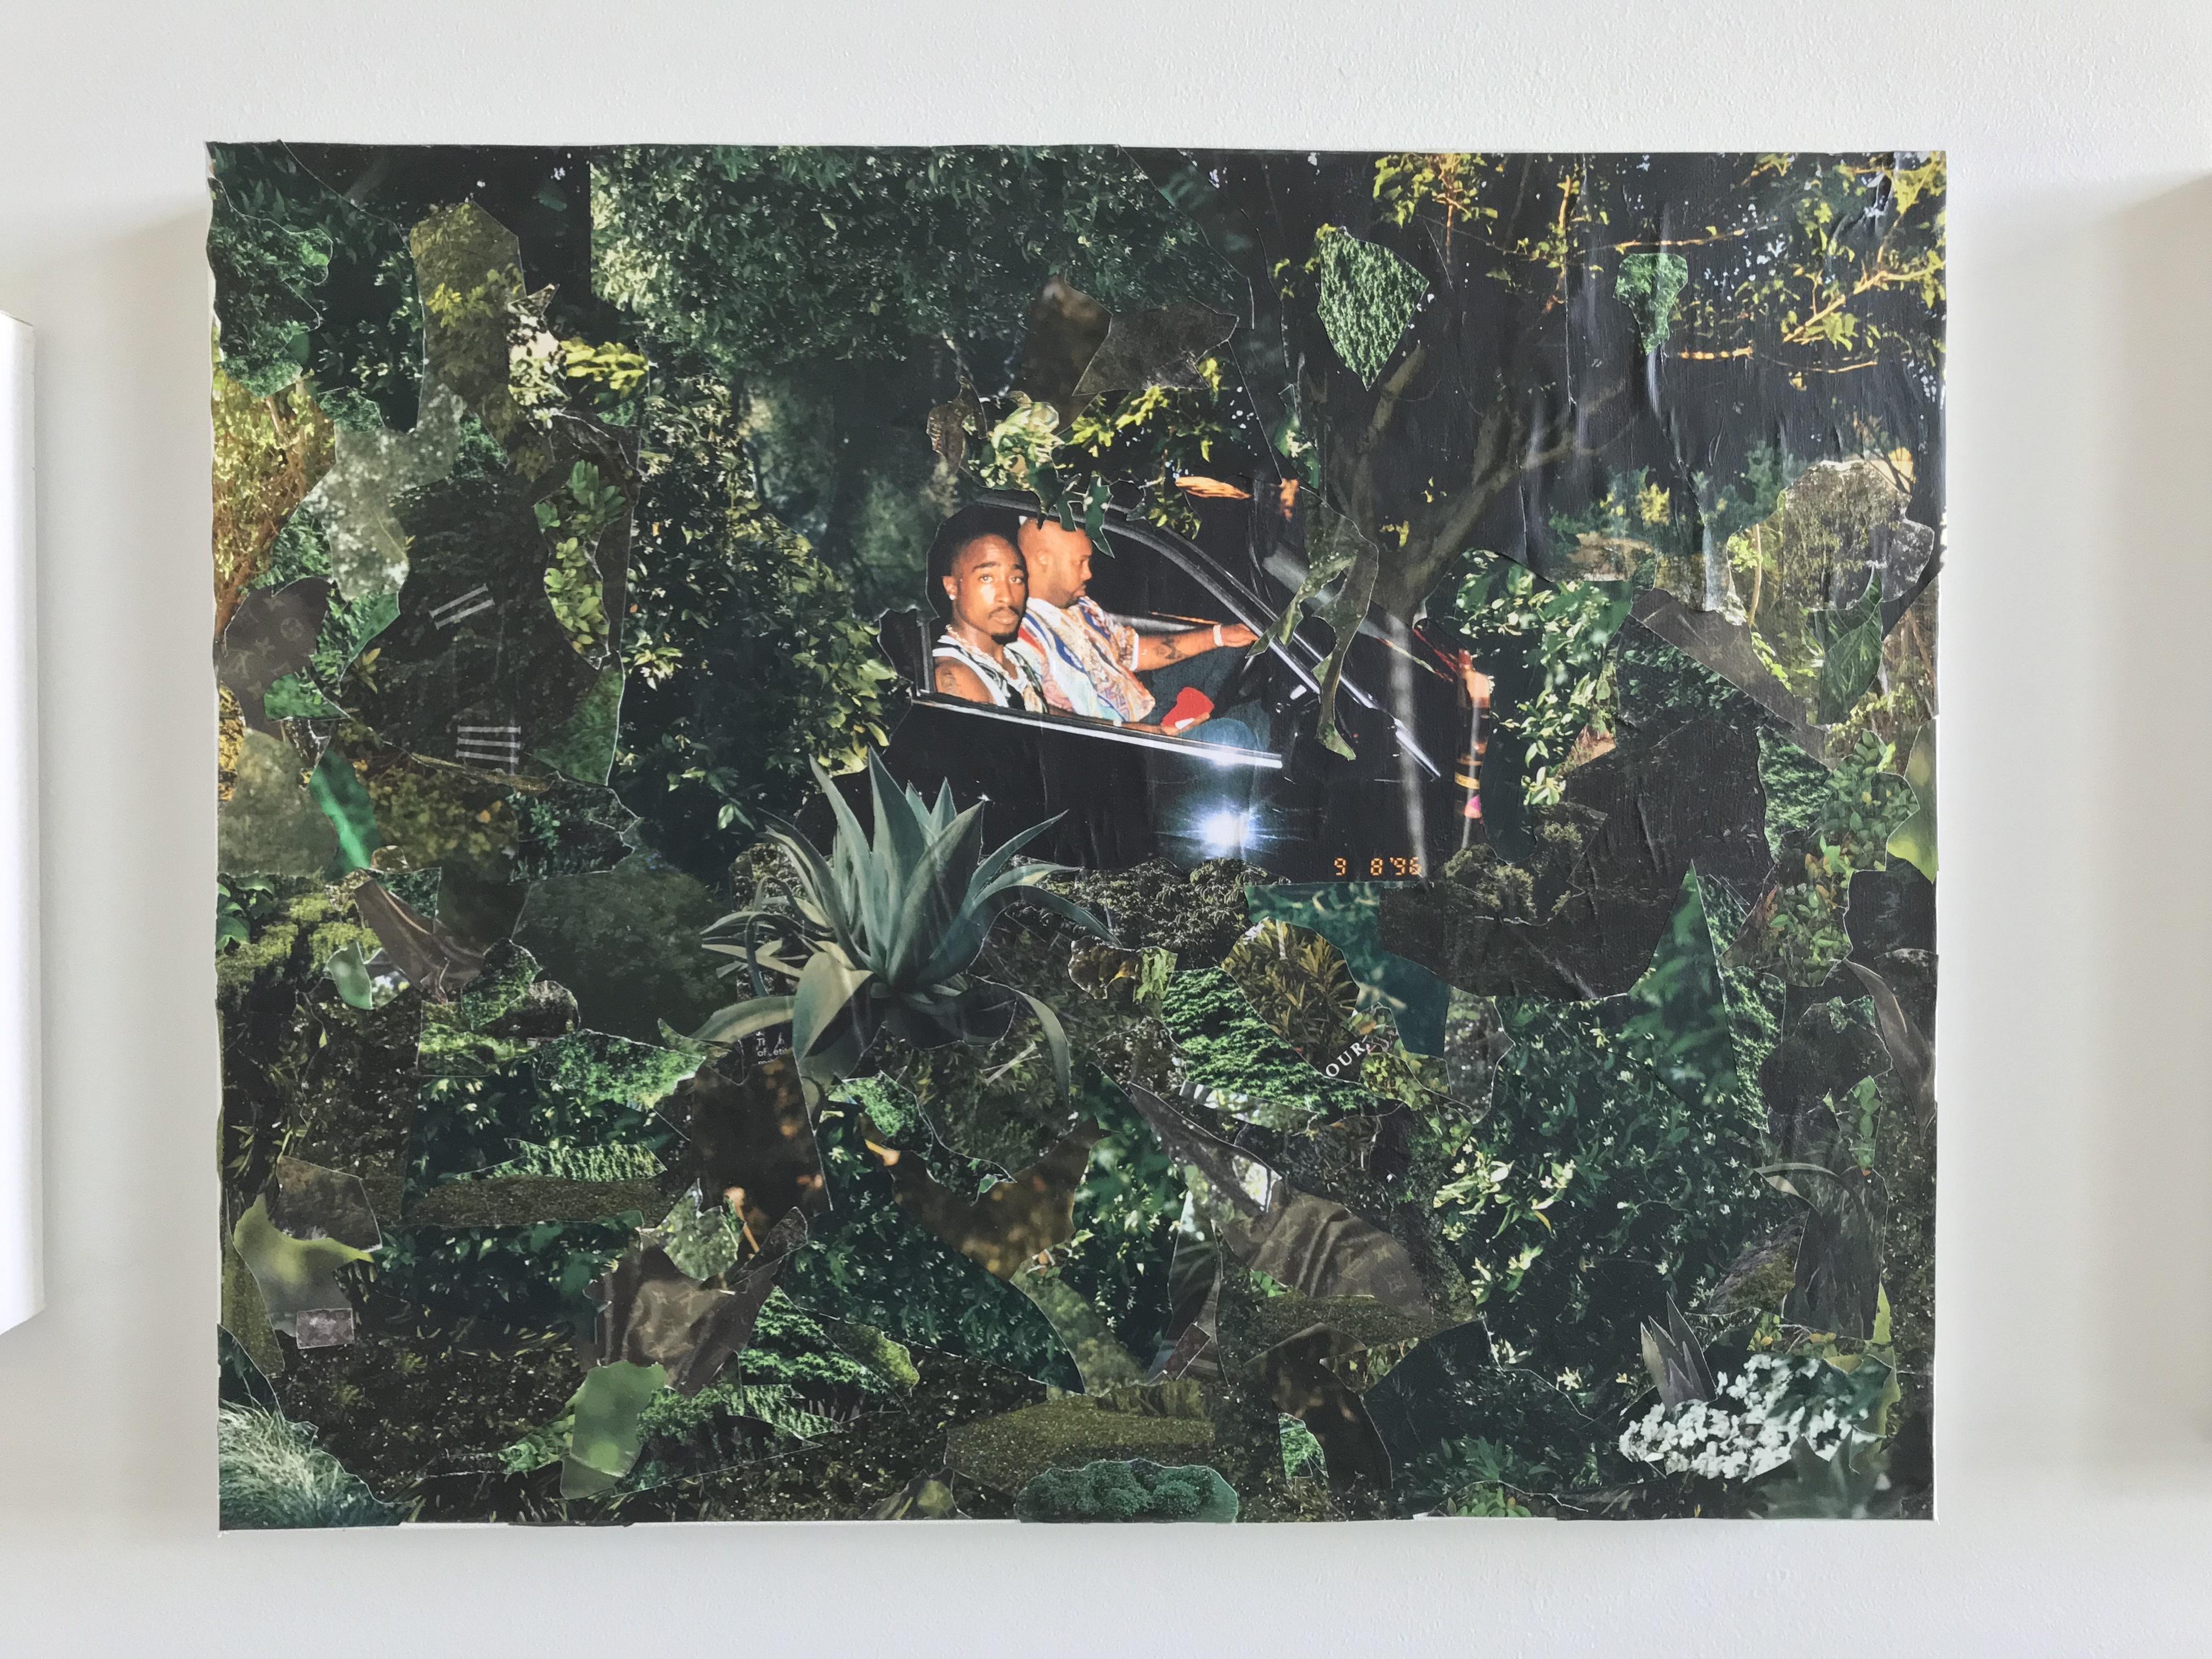 Lester Merriweather, Studio Visit, Crosstown Arts Residency Program, July 2018